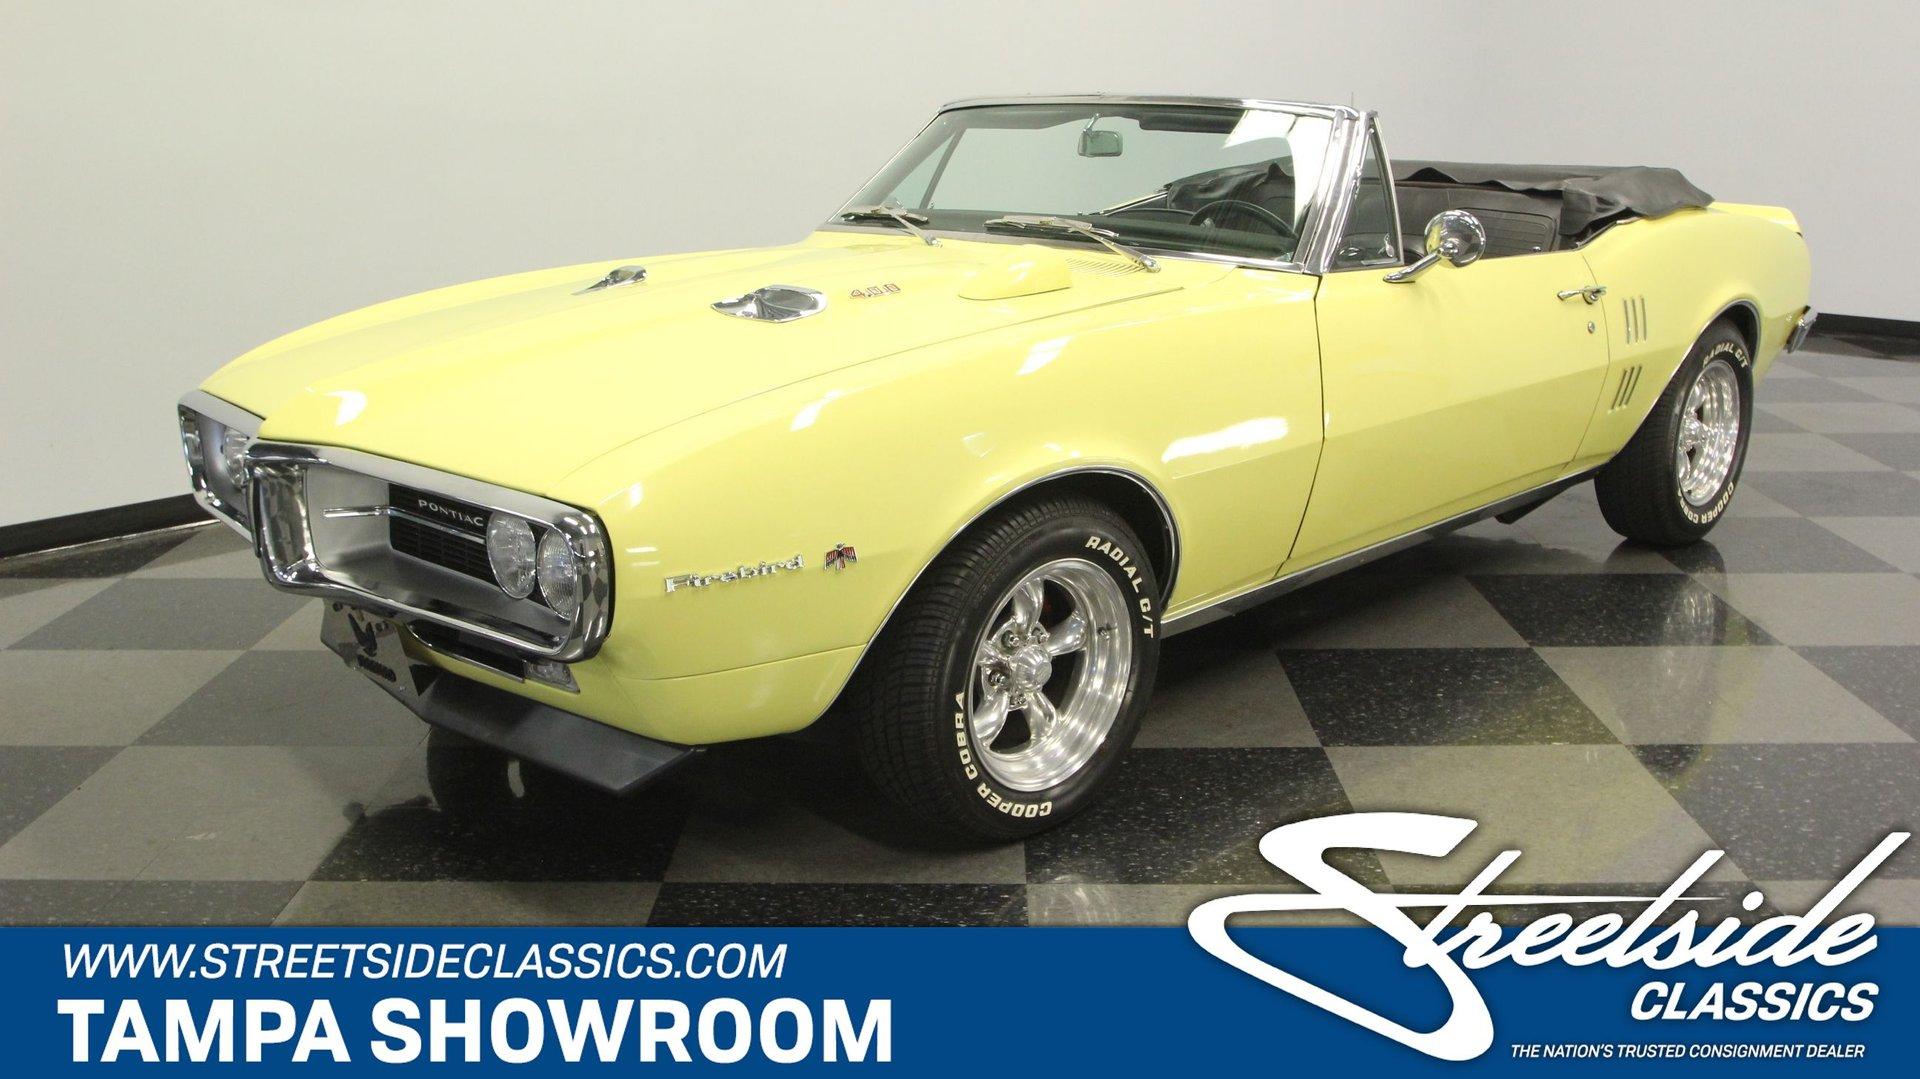 1967 Pontiac Firebird 400 Convertible for sale #167937